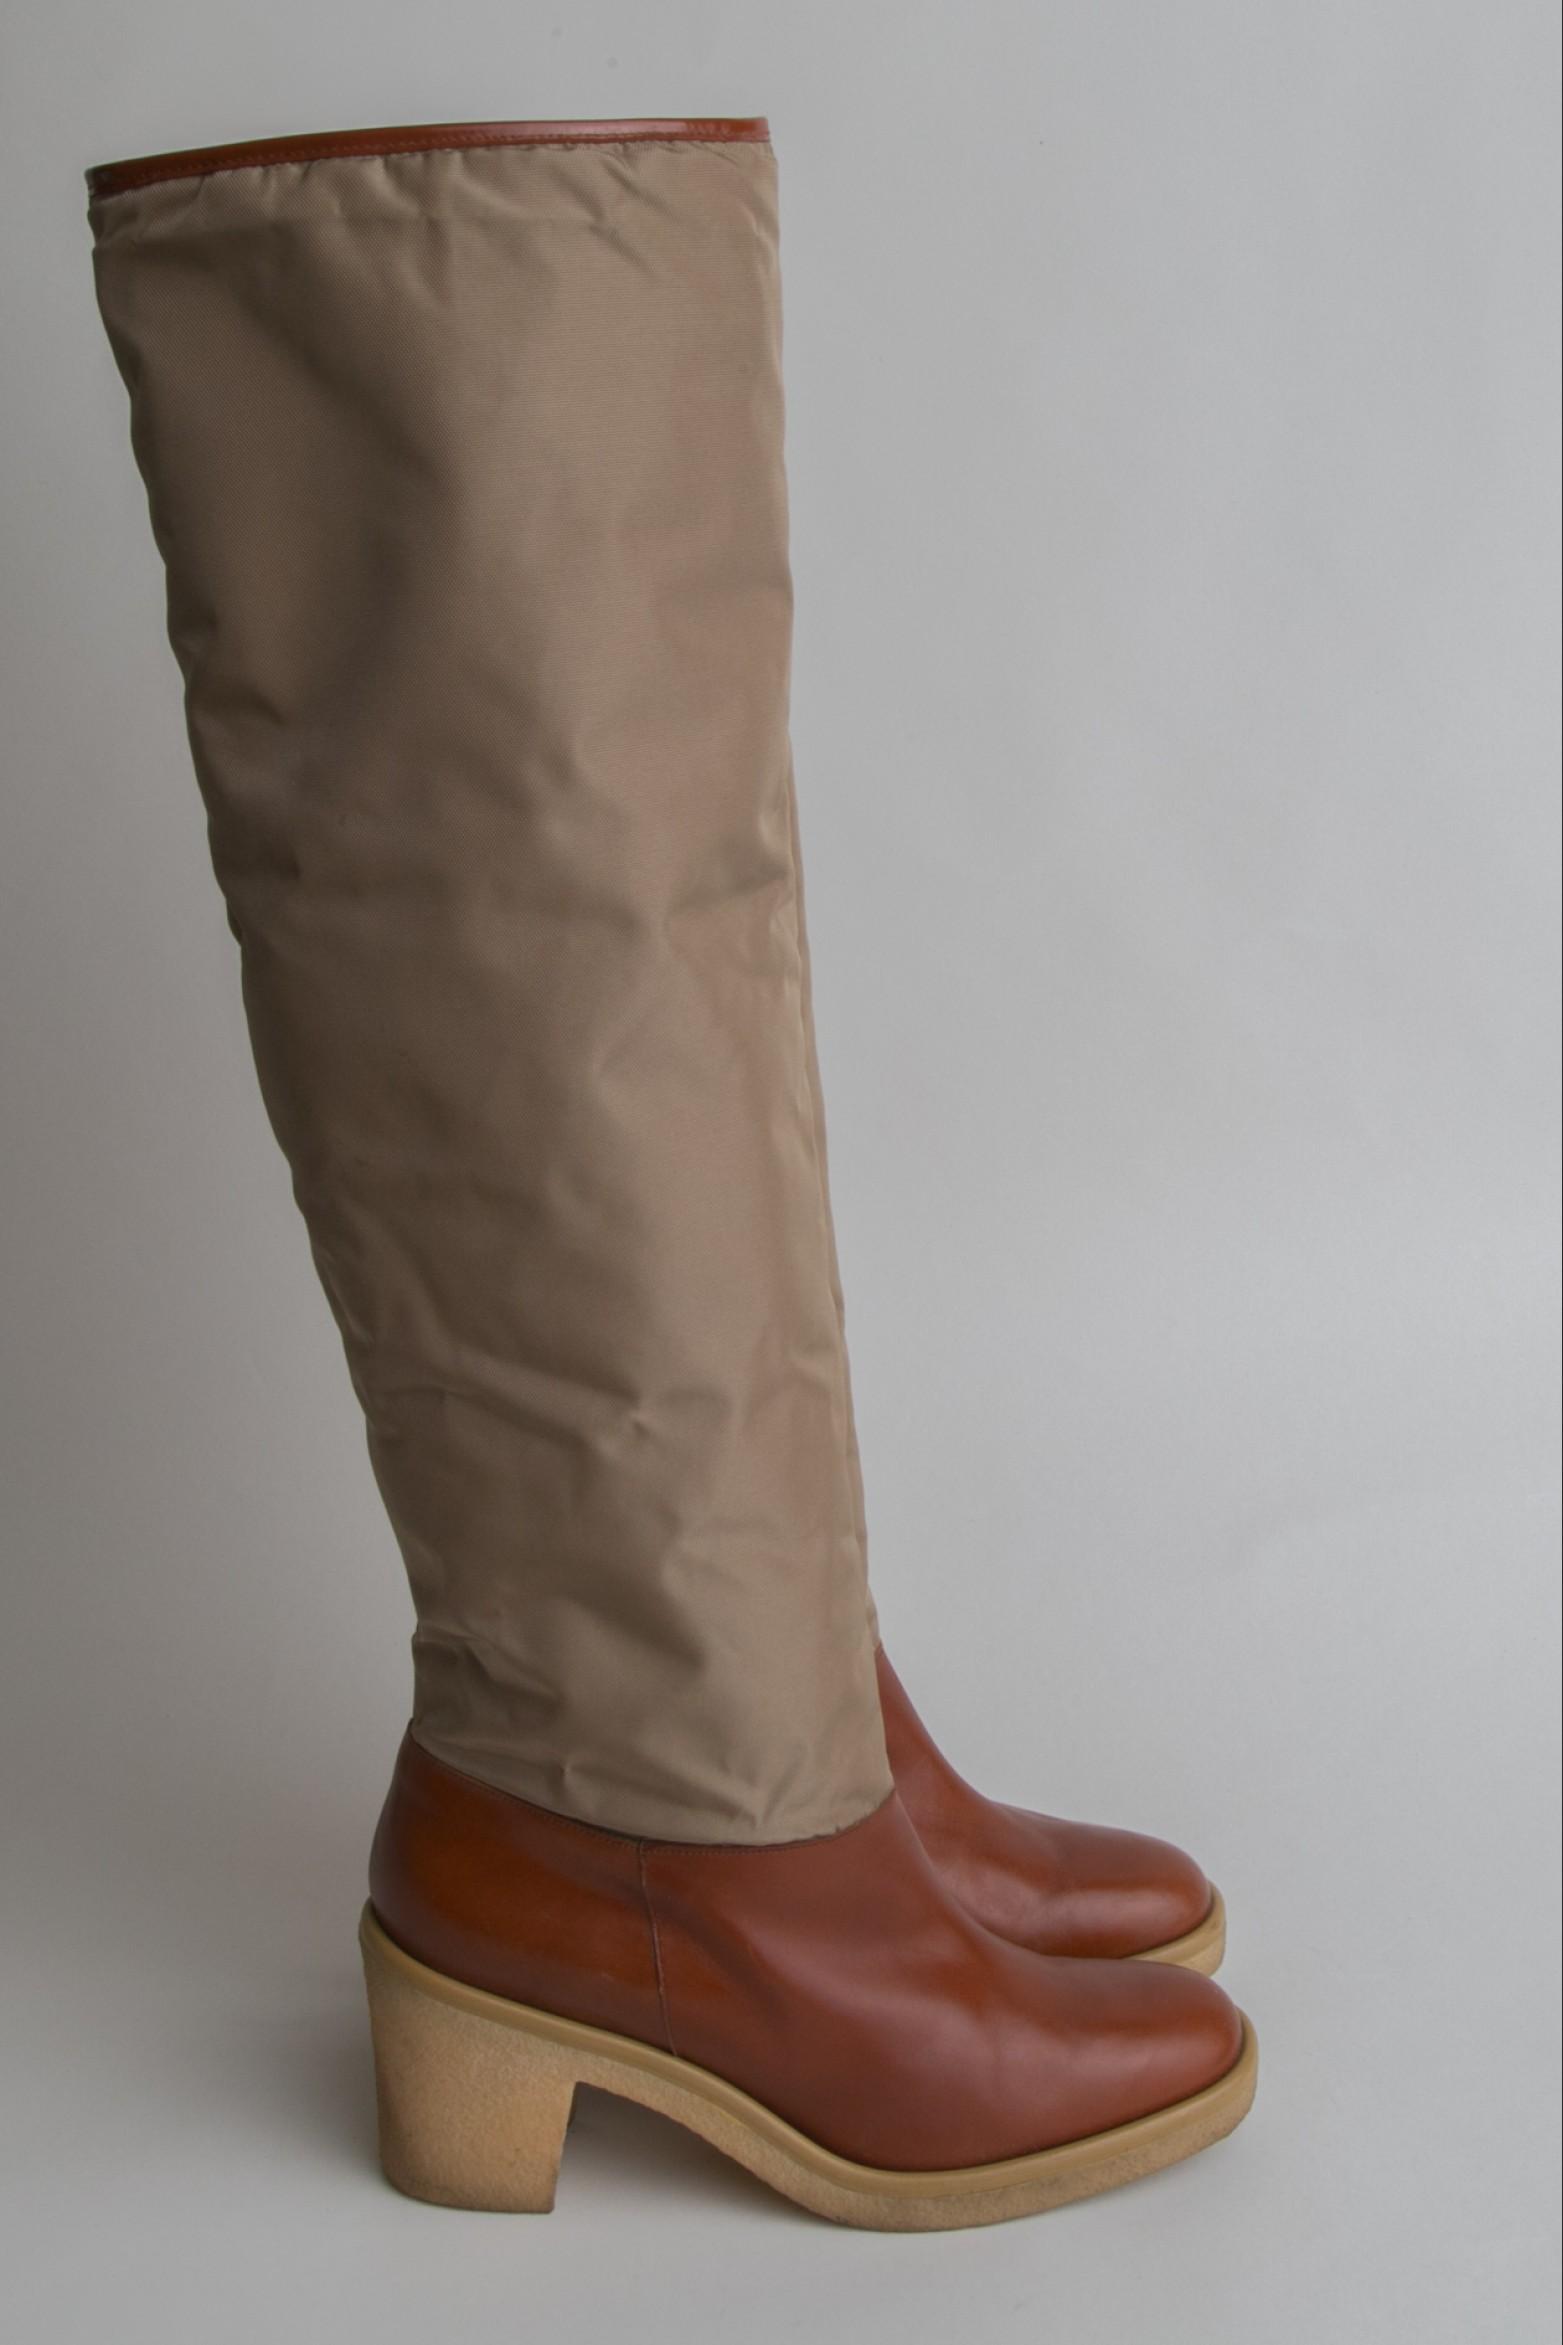 Vintage Xavier Danaud Knee-High Boots